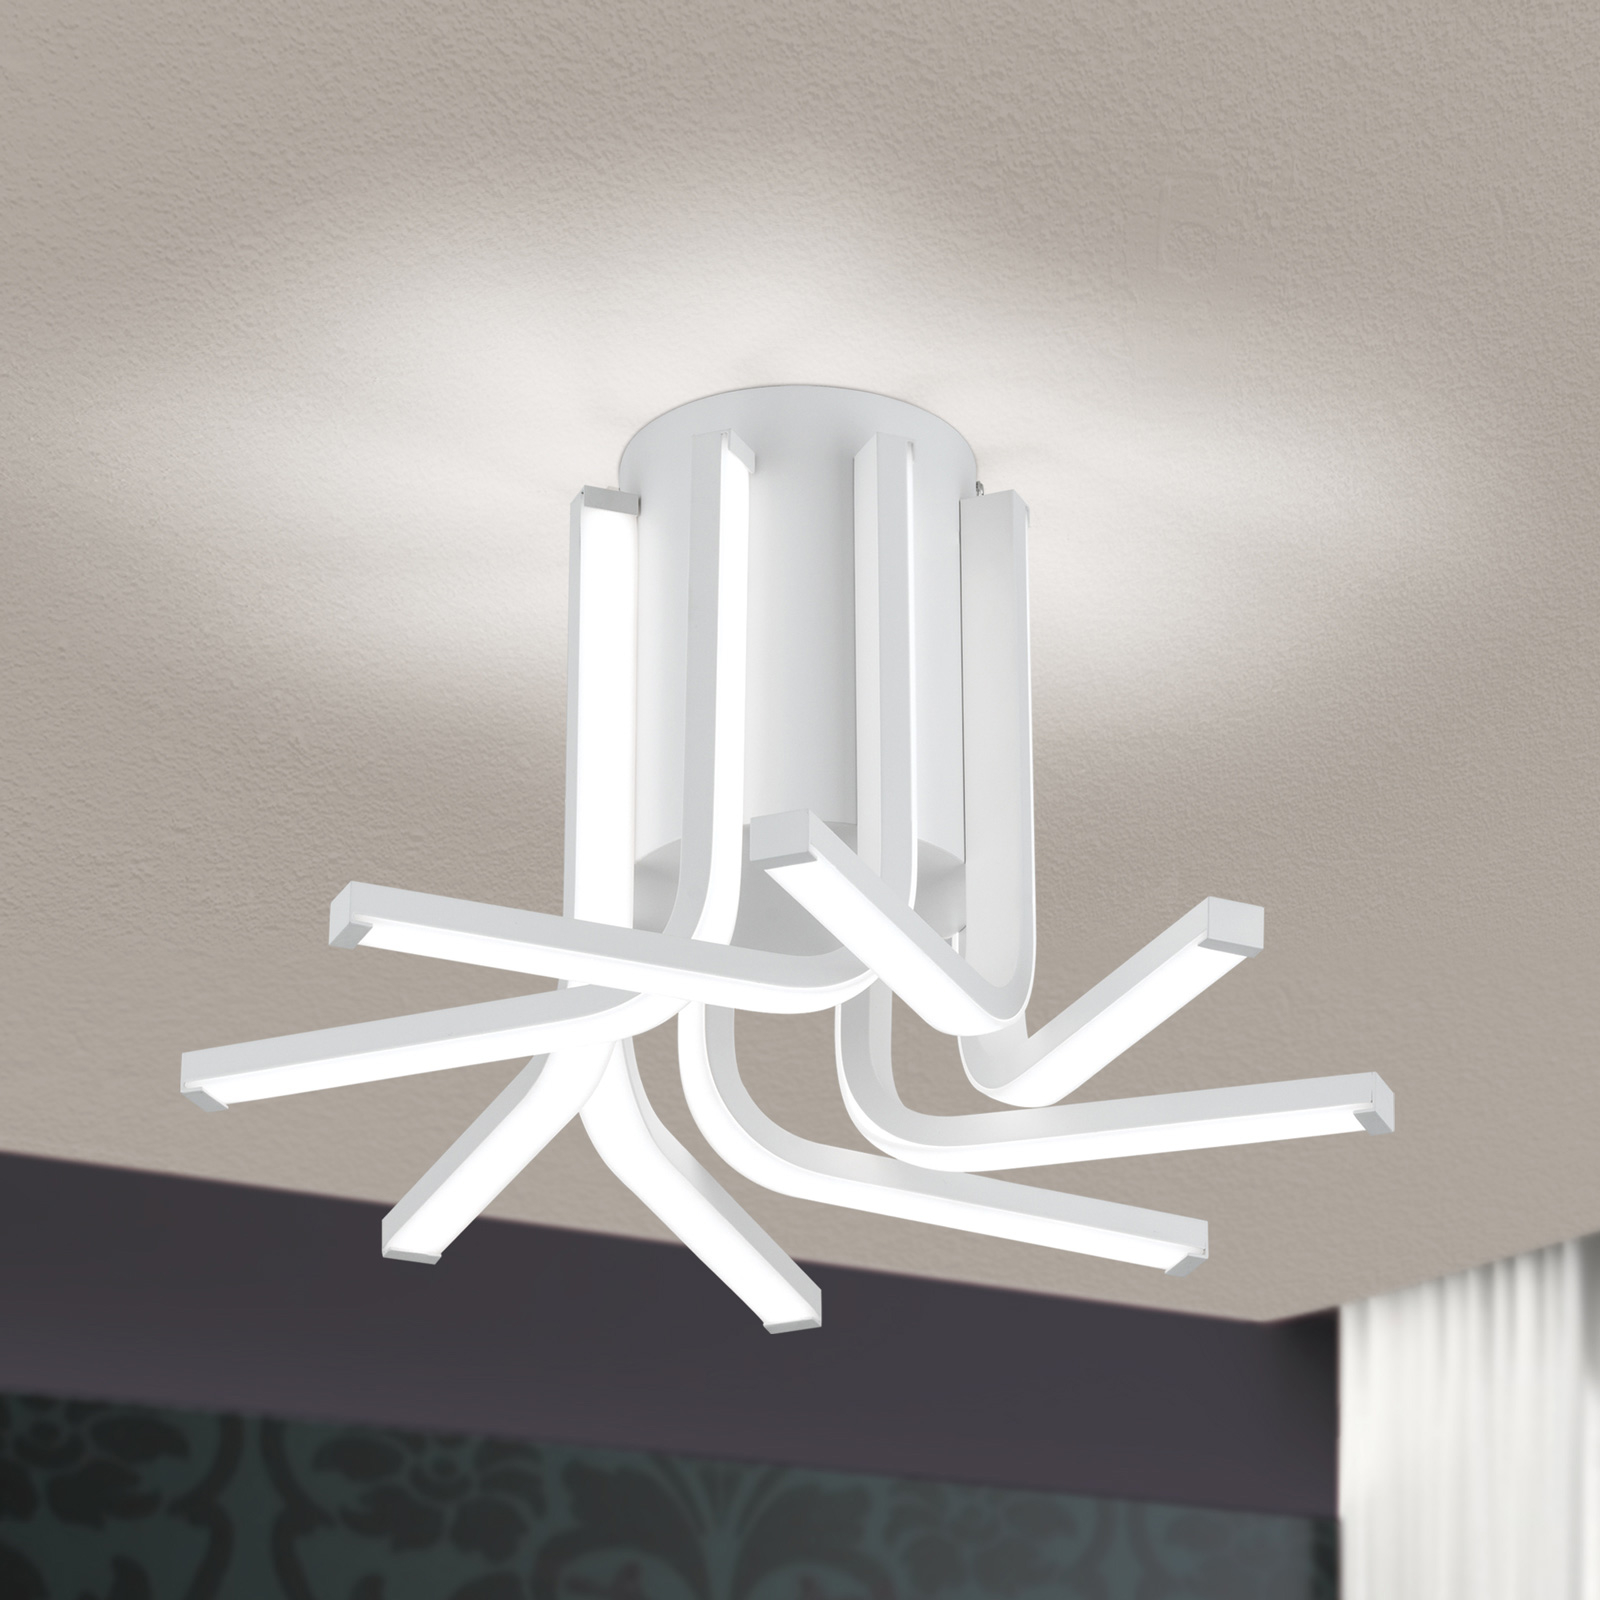 Lampa sufitowa LED Venti, ściemniana